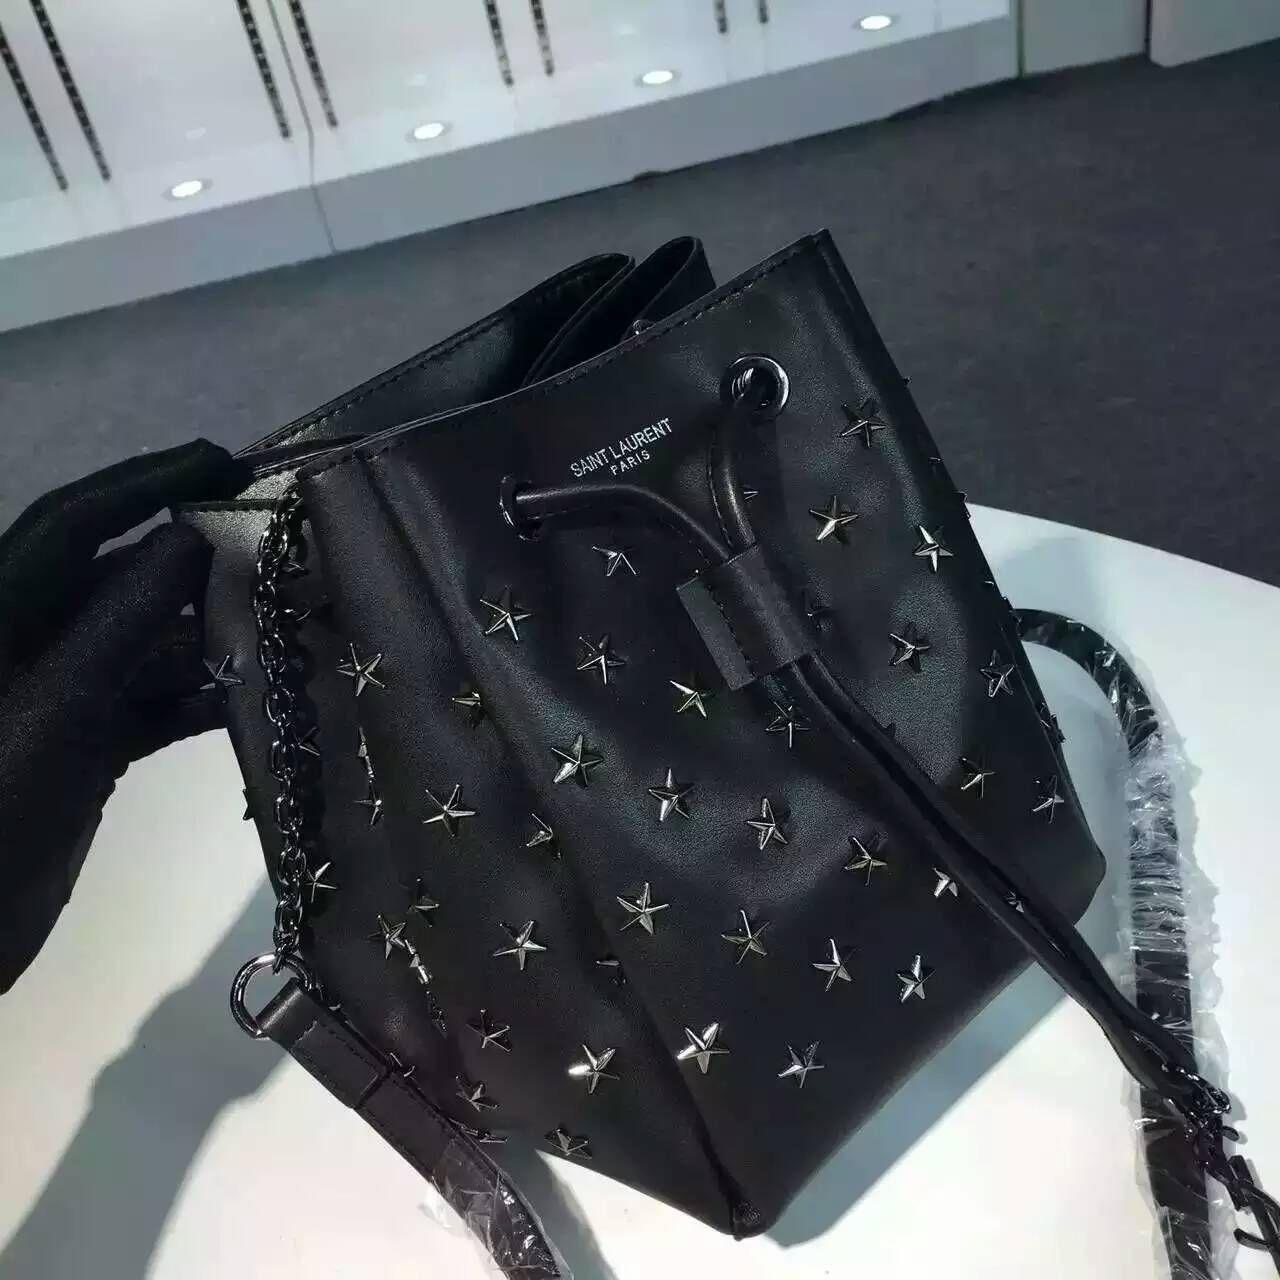 Limited Edition!2016 New Saint Laurent Bag Cheap Sale-Saint Laurent Medium  Emmanuelle Bucket Bag in Black Leather with Stars 0c621b5b374b8